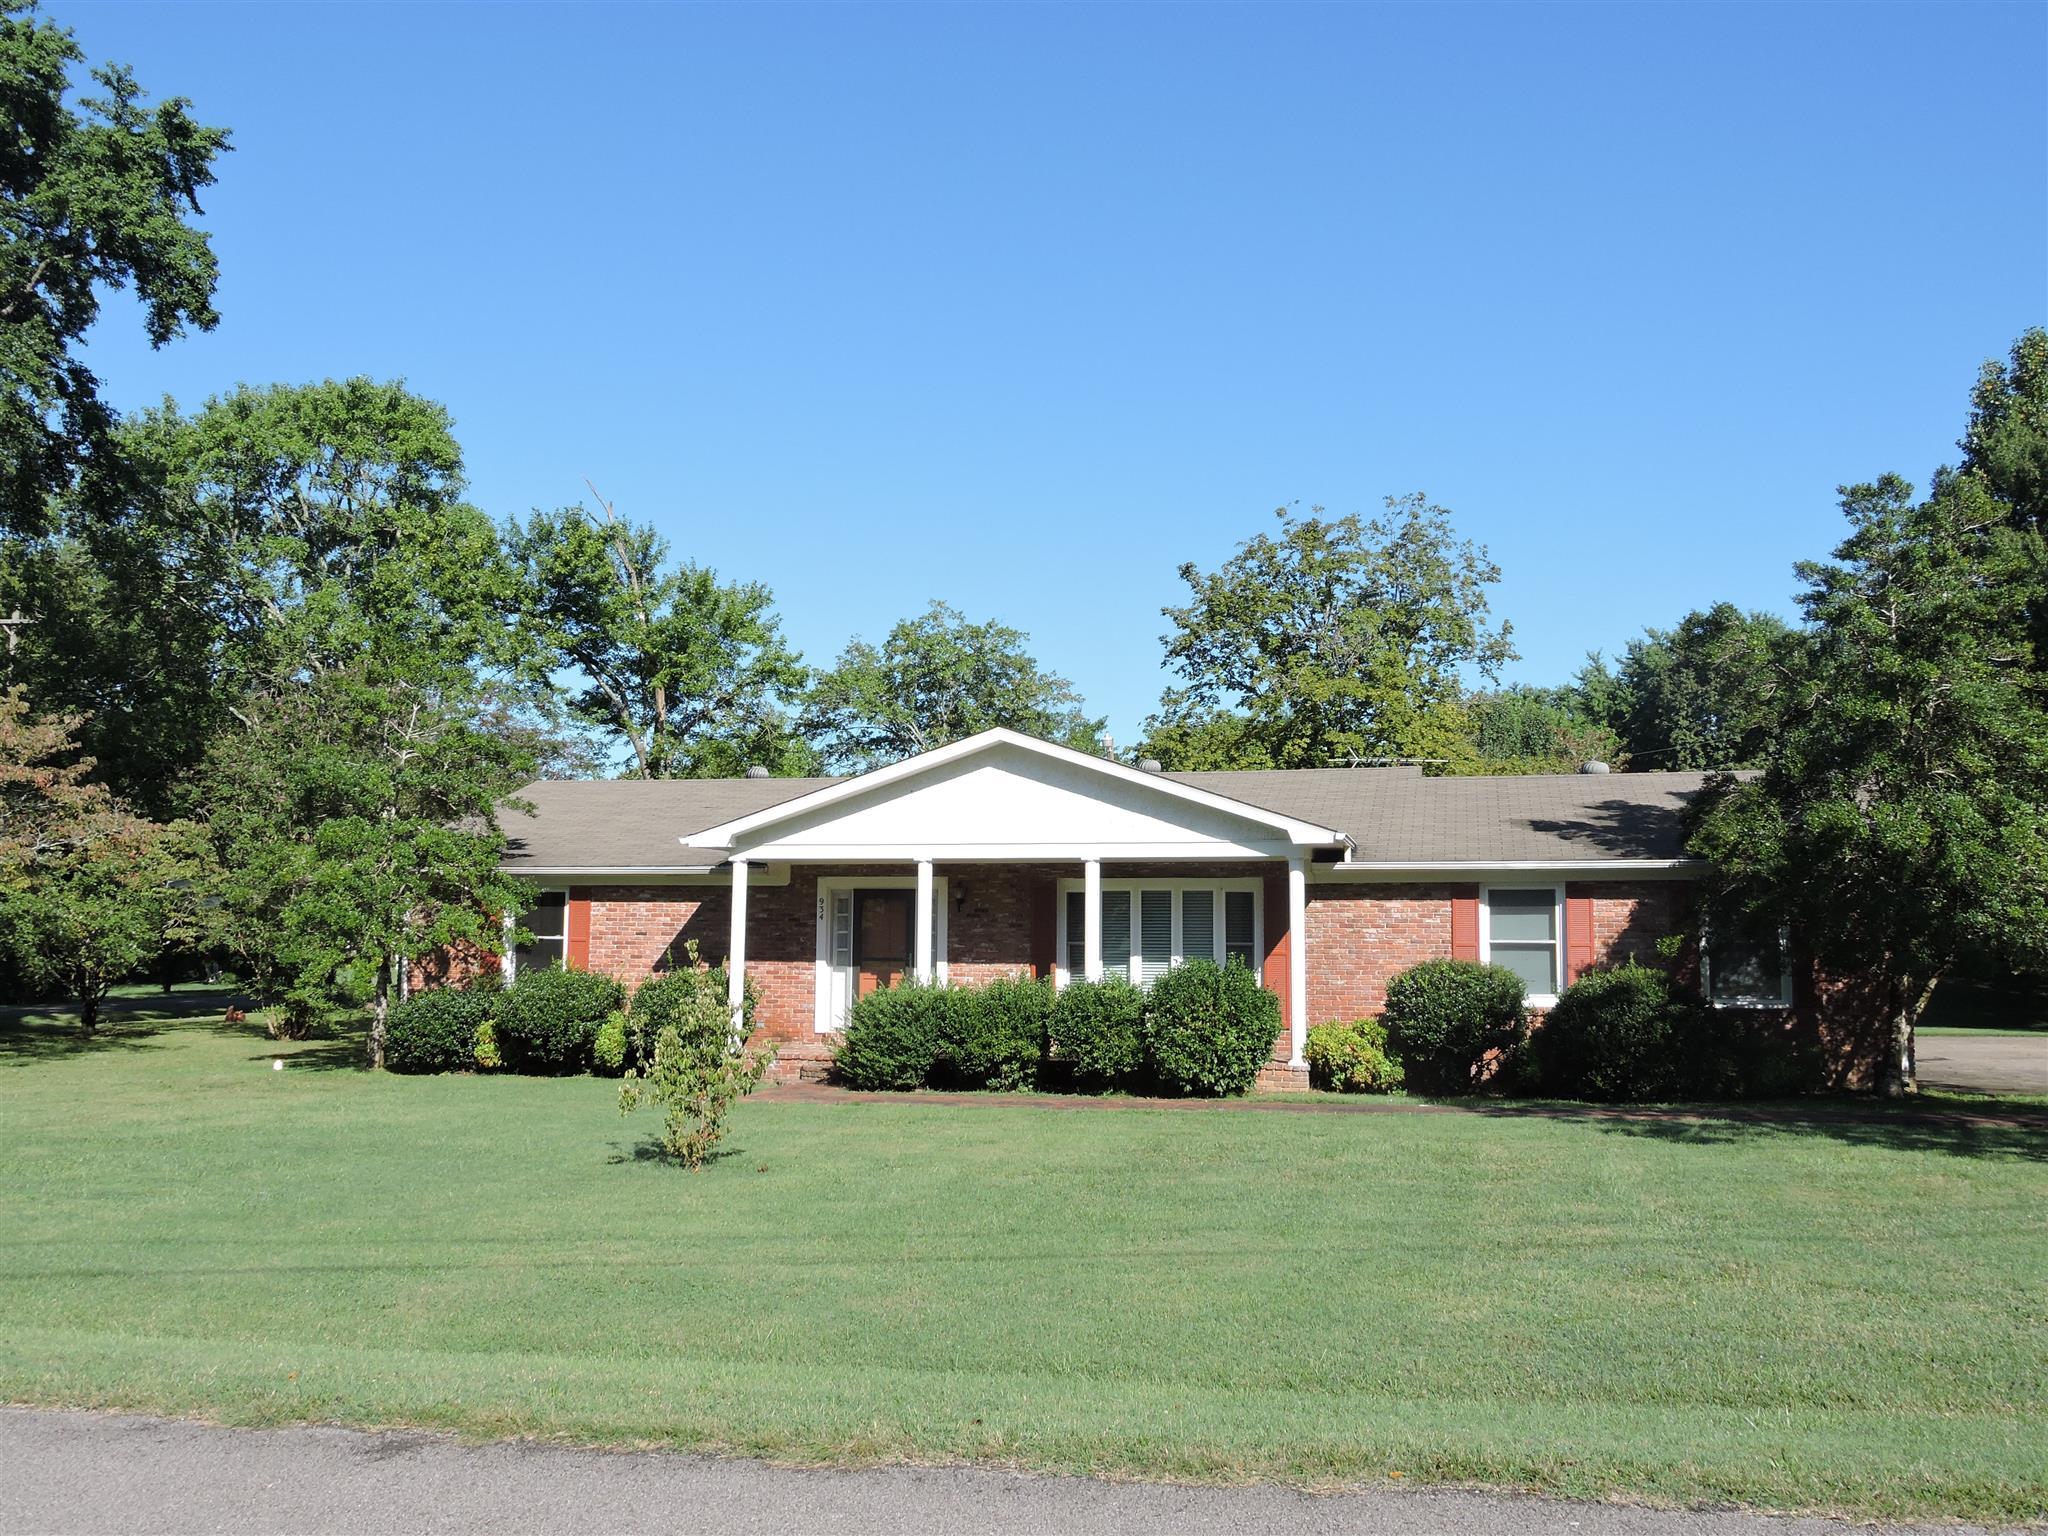 934 Lynn Drive, Gallatin, TN 37066 - Gallatin, TN real estate listing